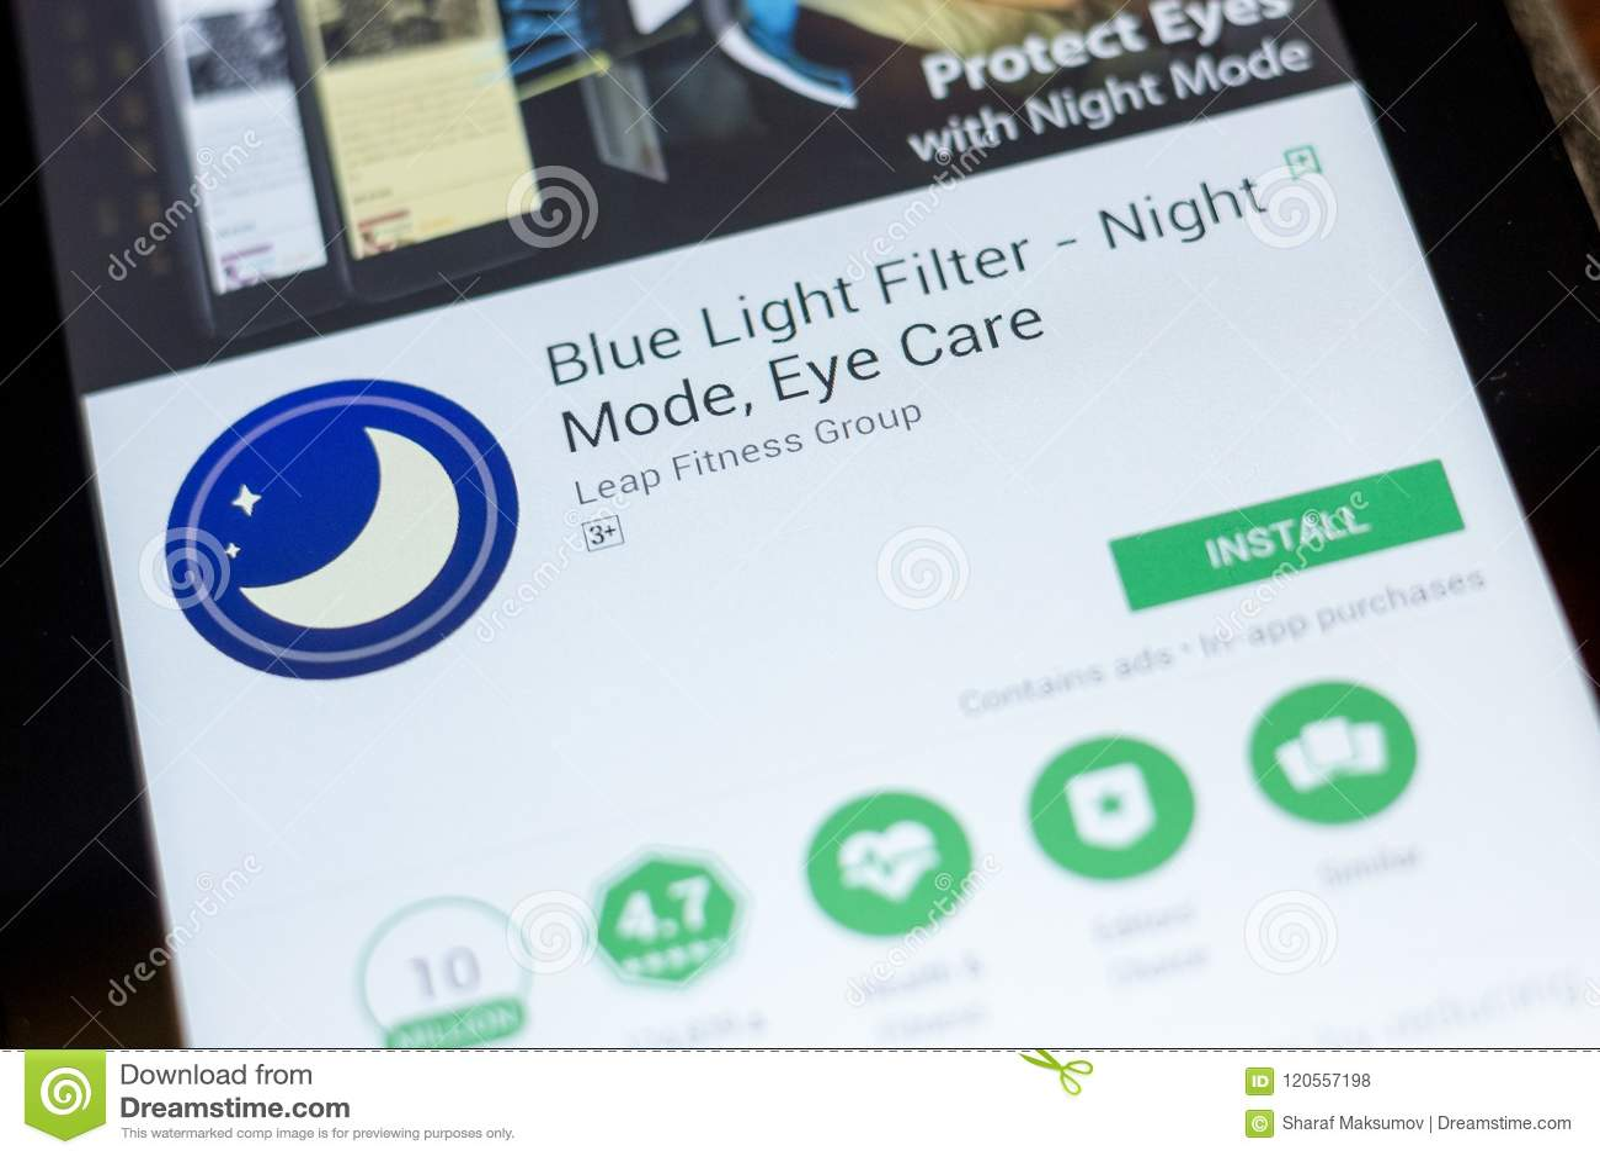 Ryazan, Russia - July 03, 2018: Blue Light Filter - Night Mode, Eye